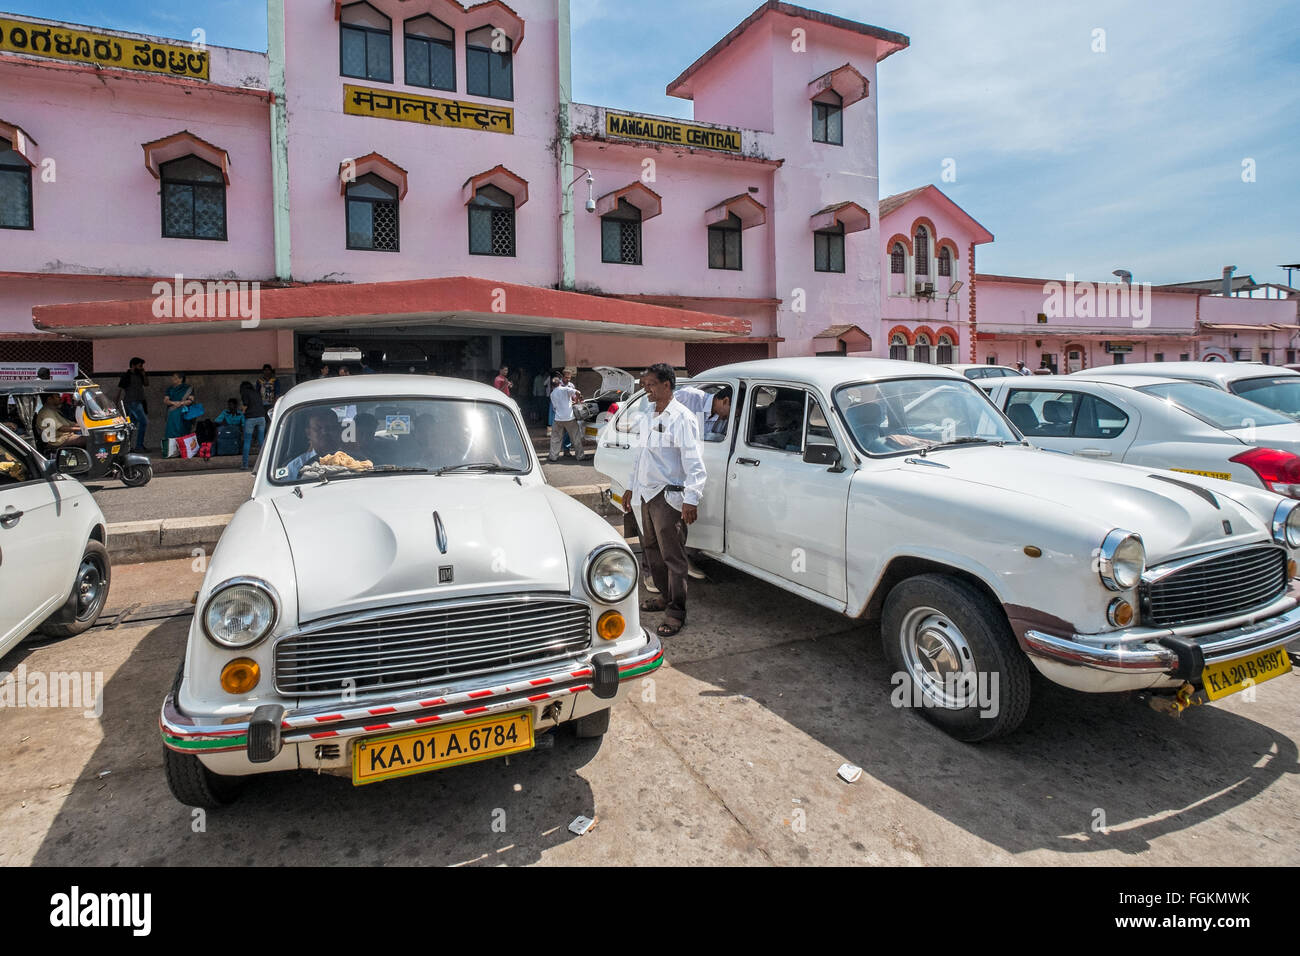 Hindustan Ambassador Classic Stock Photos & Hindustan